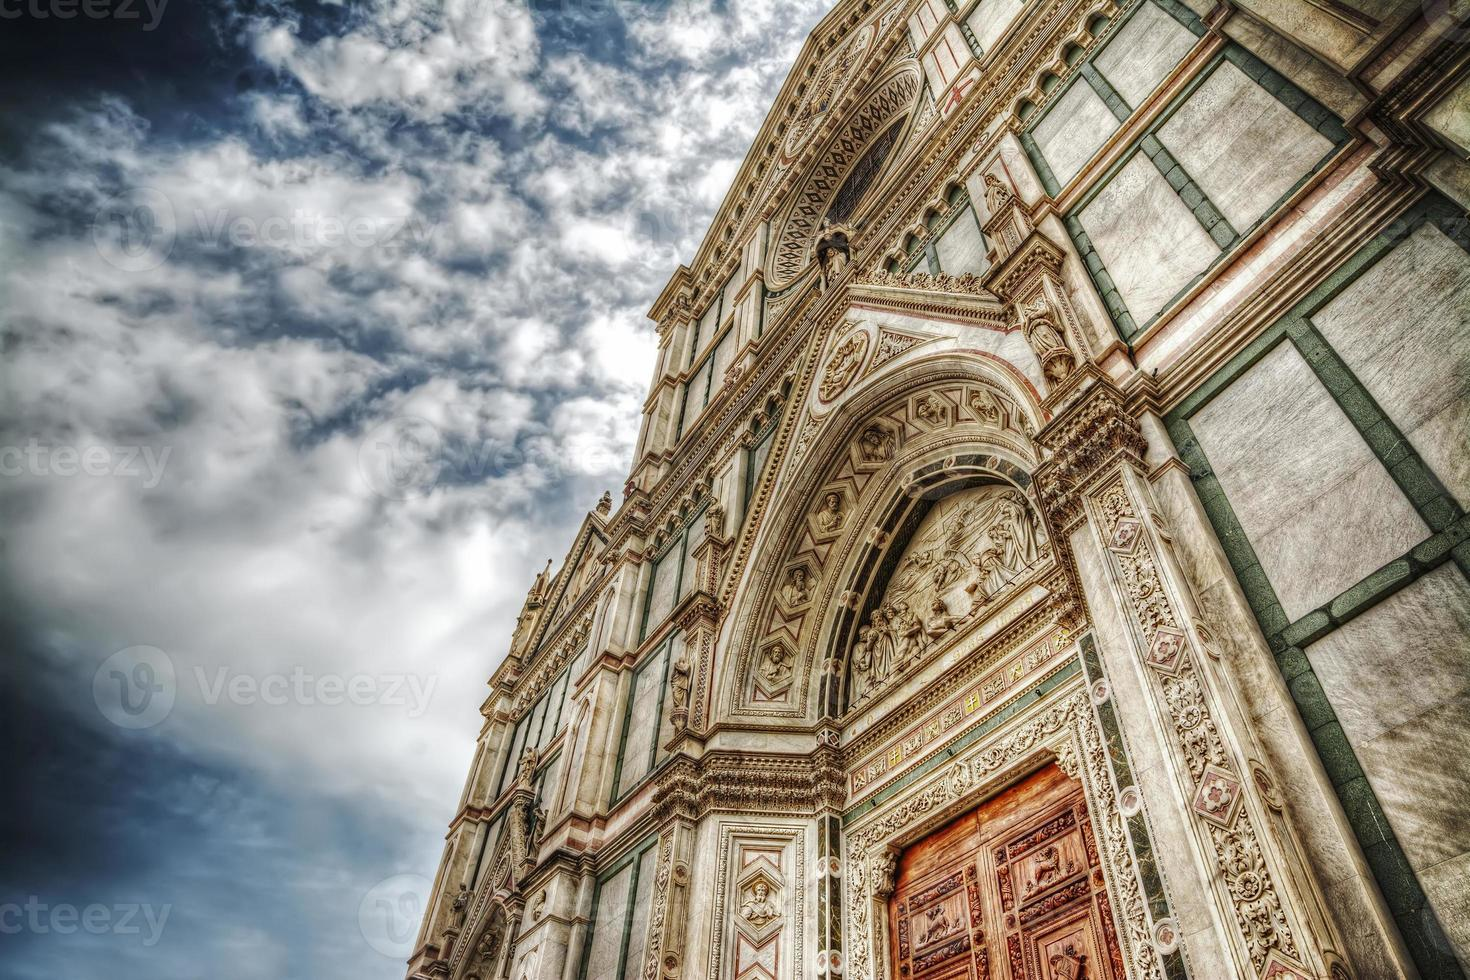 Santa Croce catheral under a dramatic sky photo